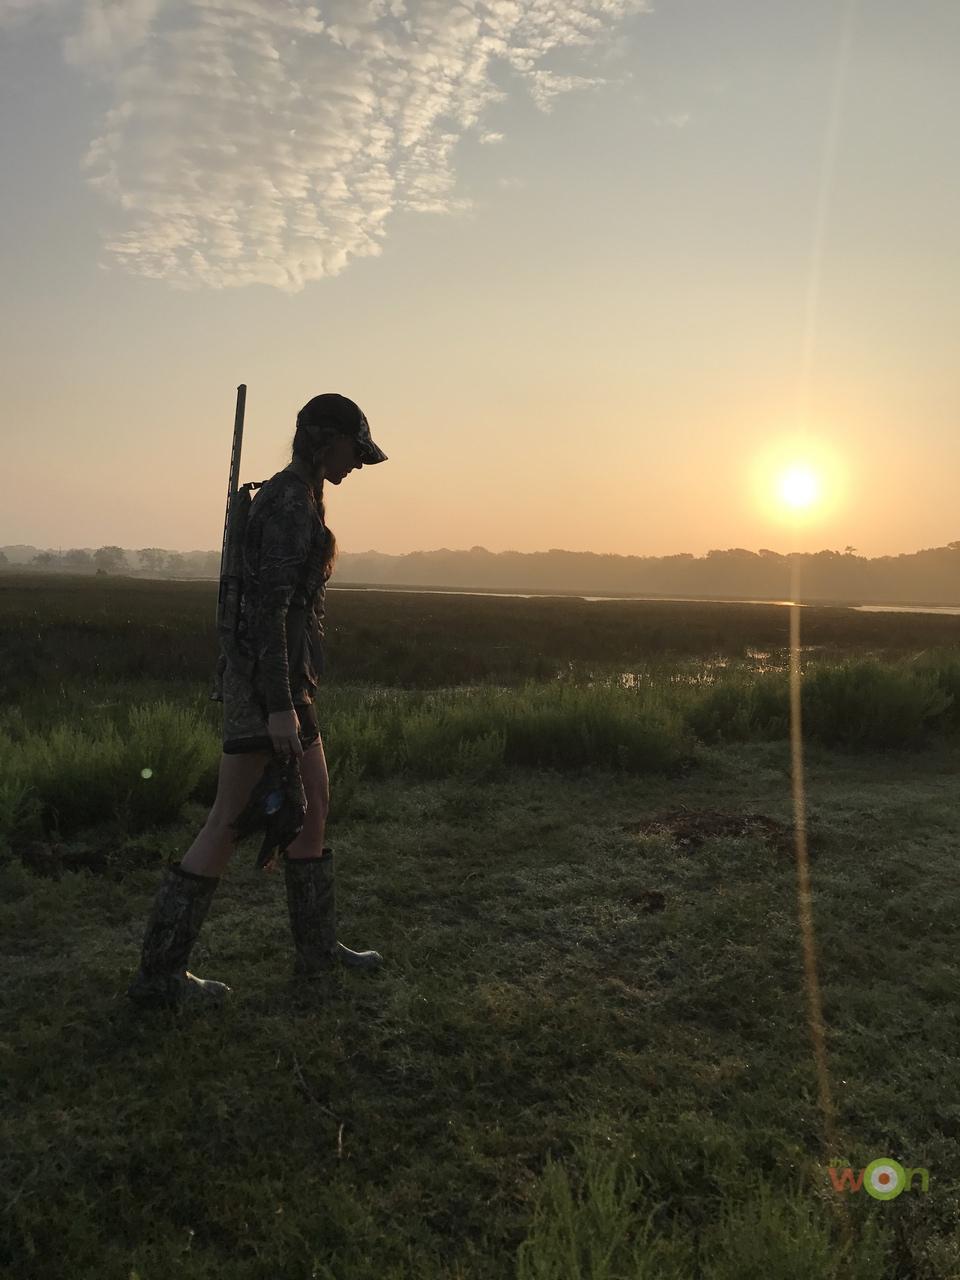 HollisLumpkin_TXPhoto_Sunrise Silhouette